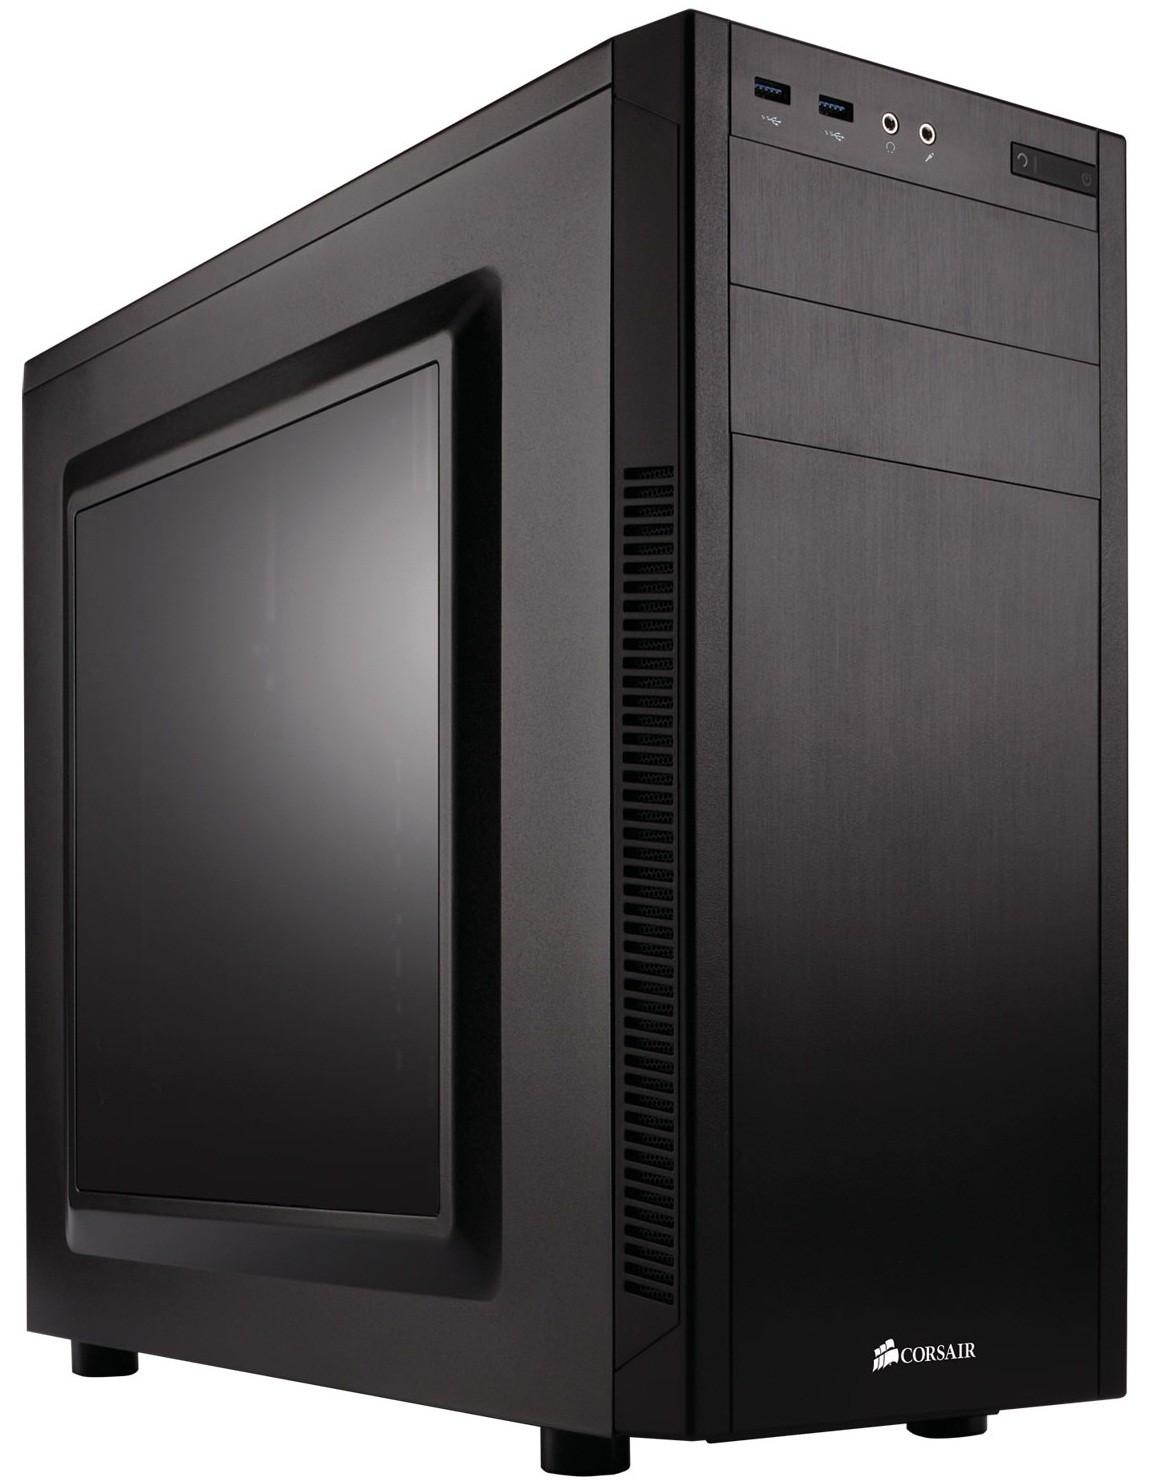 boitier gamer corsair carbide 100r. Black Bedroom Furniture Sets. Home Design Ideas